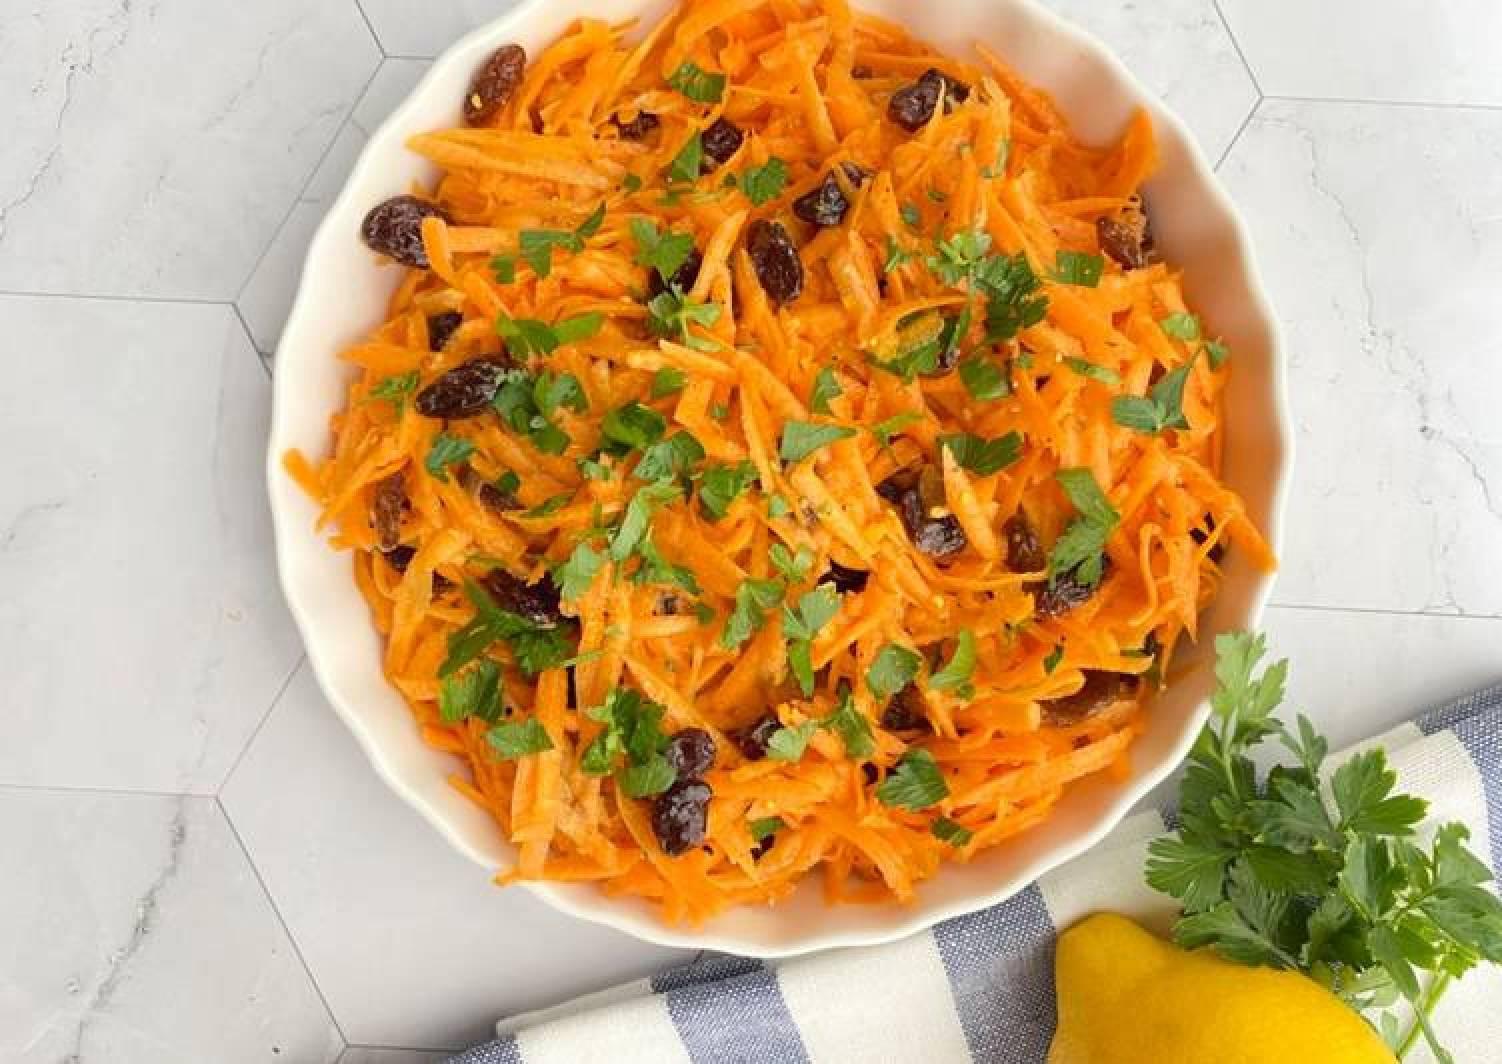 Carrot raisin summer salad